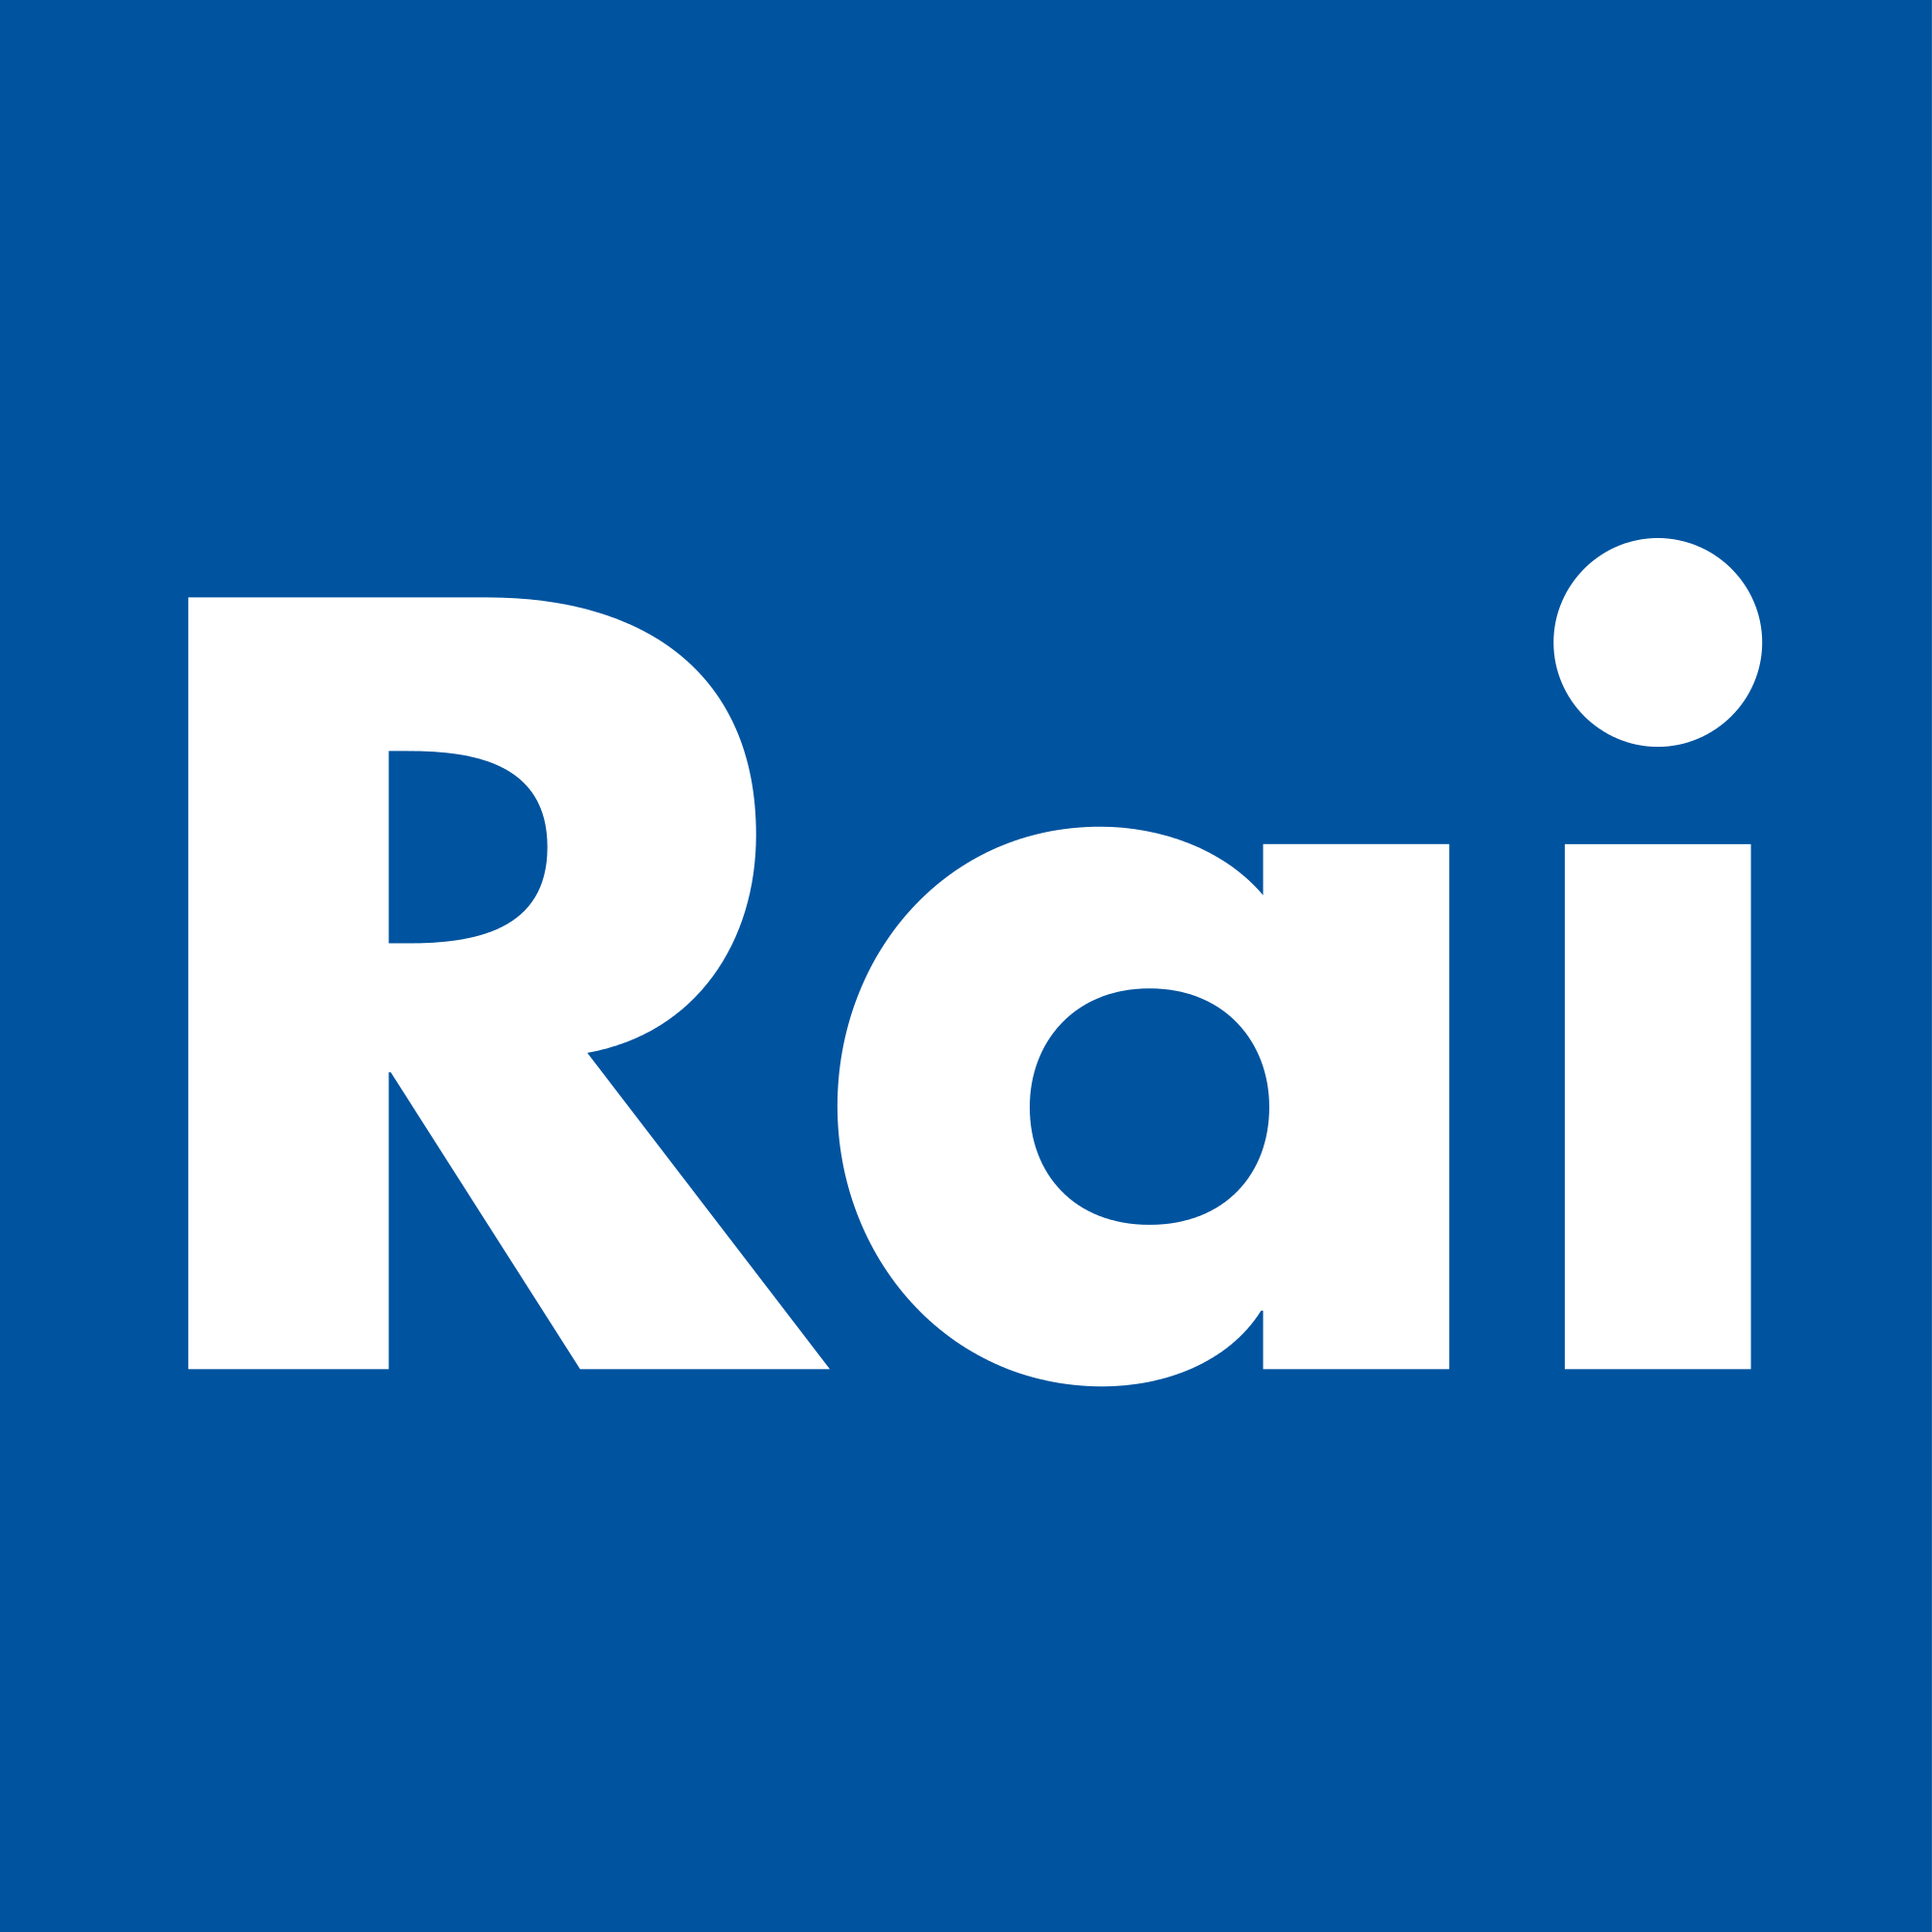 rai   radiotelevisione italiana logo svg